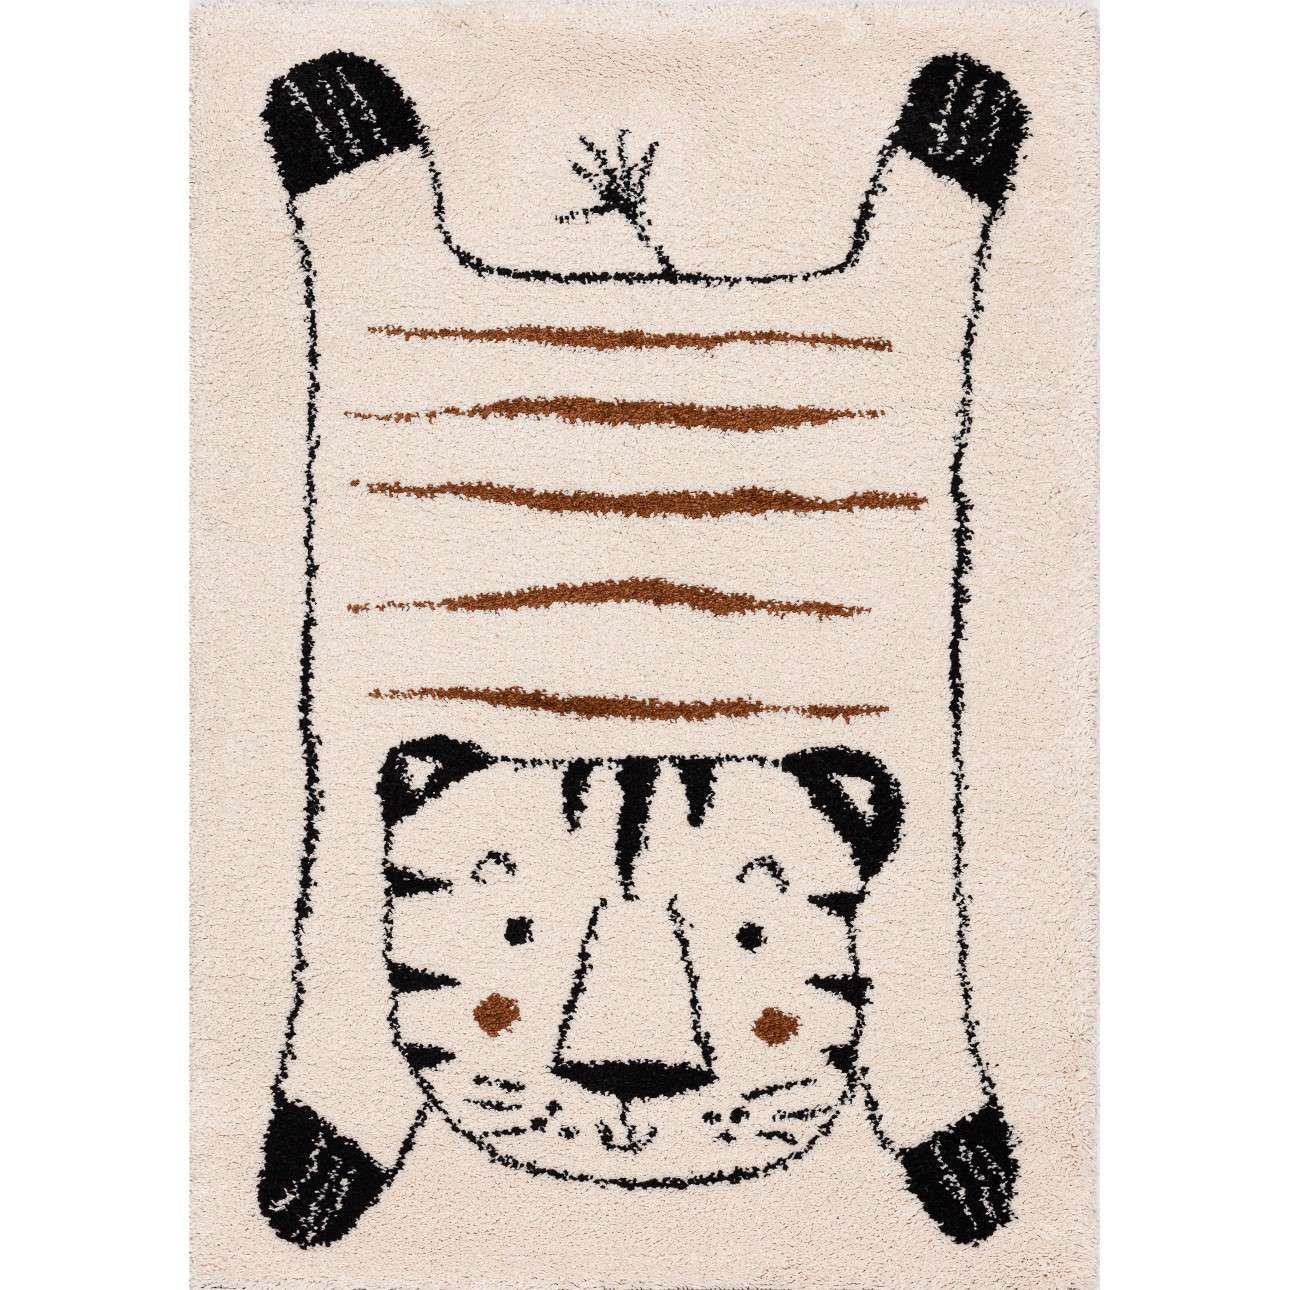 Tiger kilimas 120x170cm